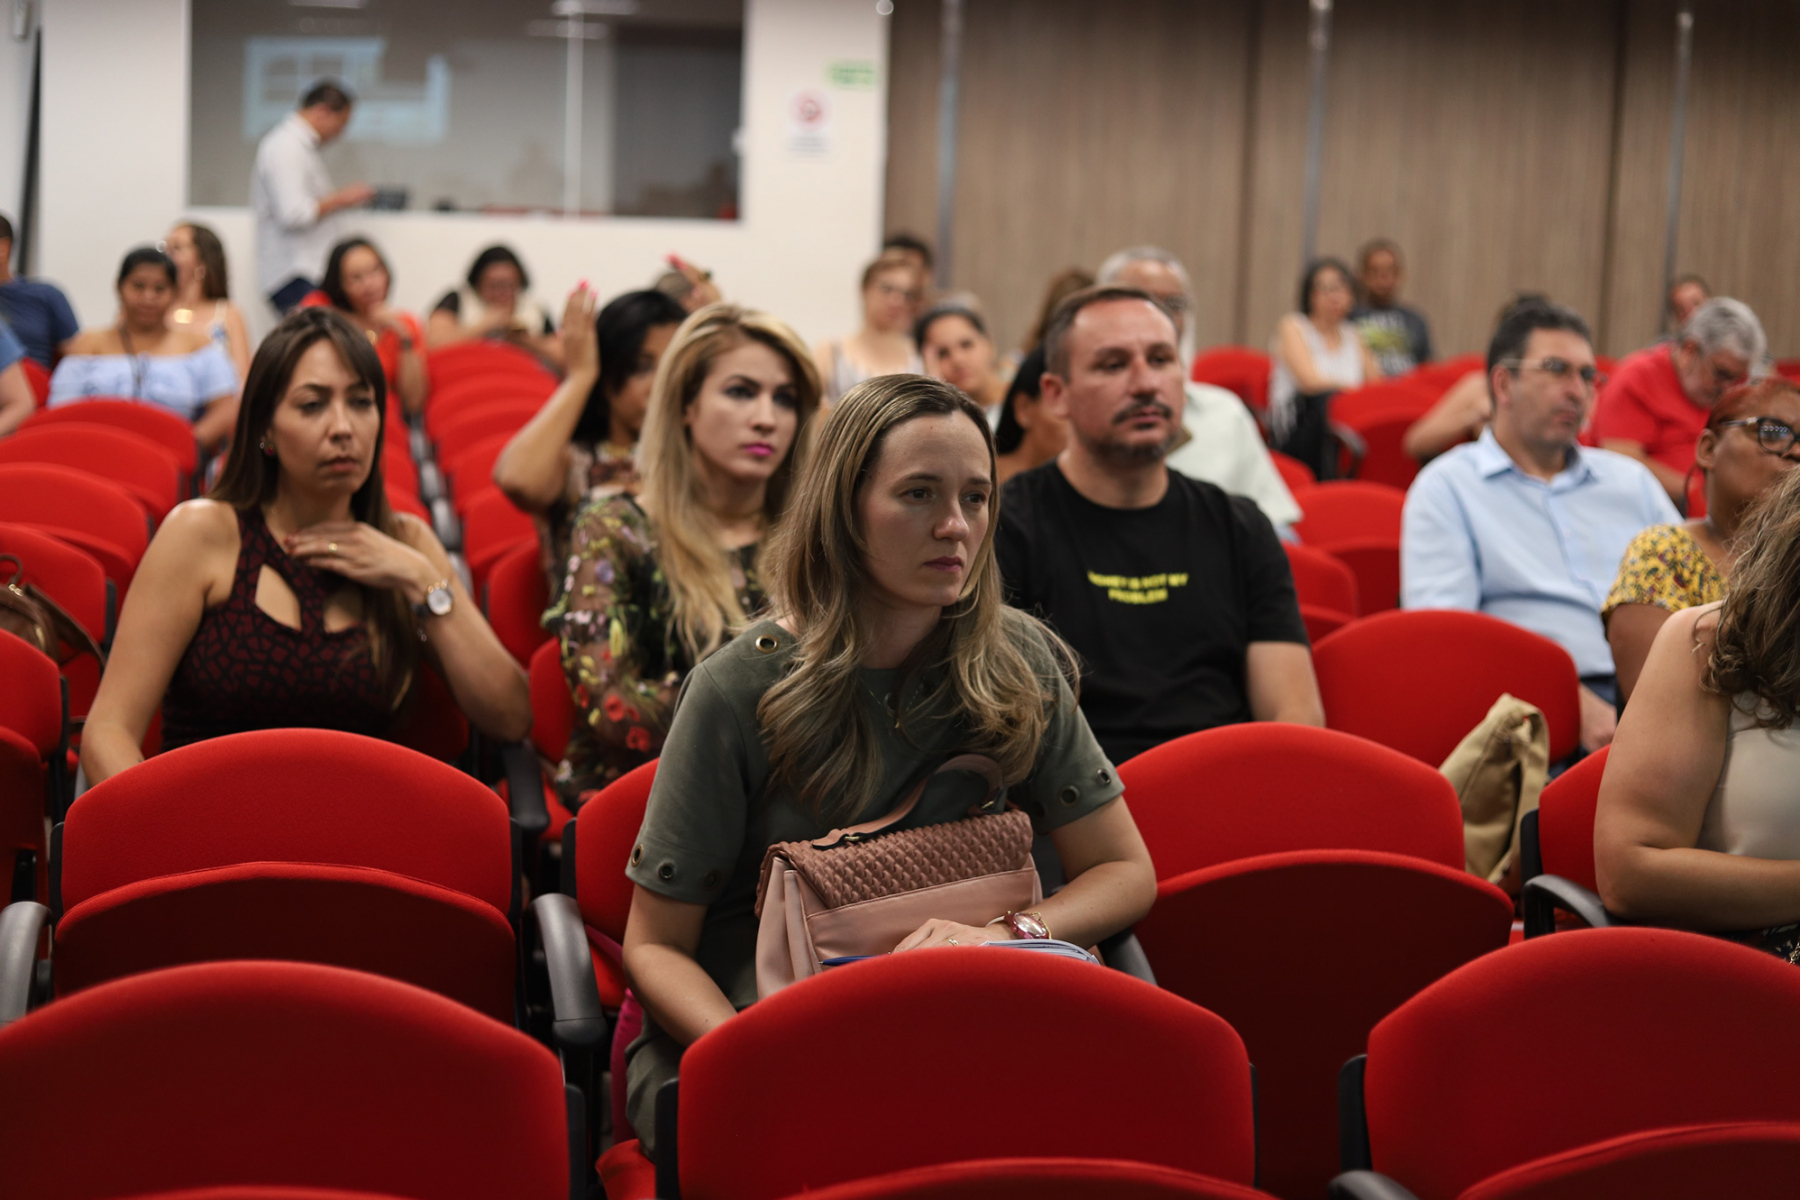 2019.09.19-Plenaria-sobre-Gestao-Democratica_fotos-ECOM-14